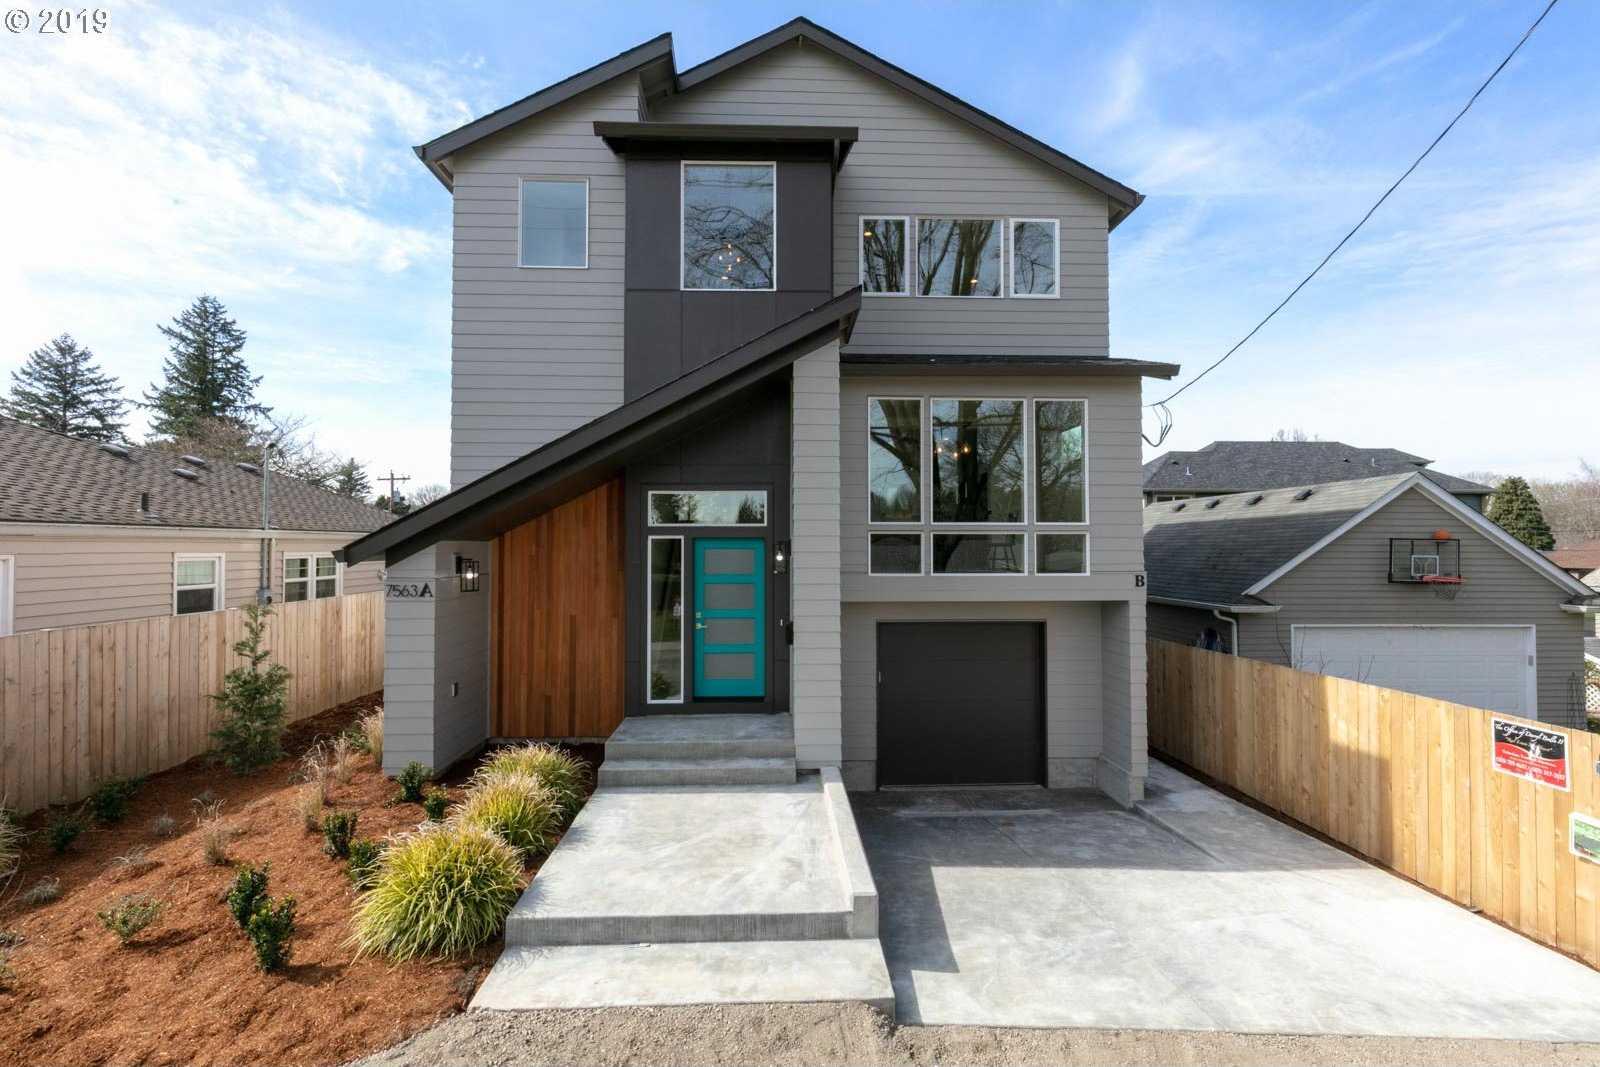 $749,900 - 4Br/4Ba -  for Sale in Eastmoreland, Portland